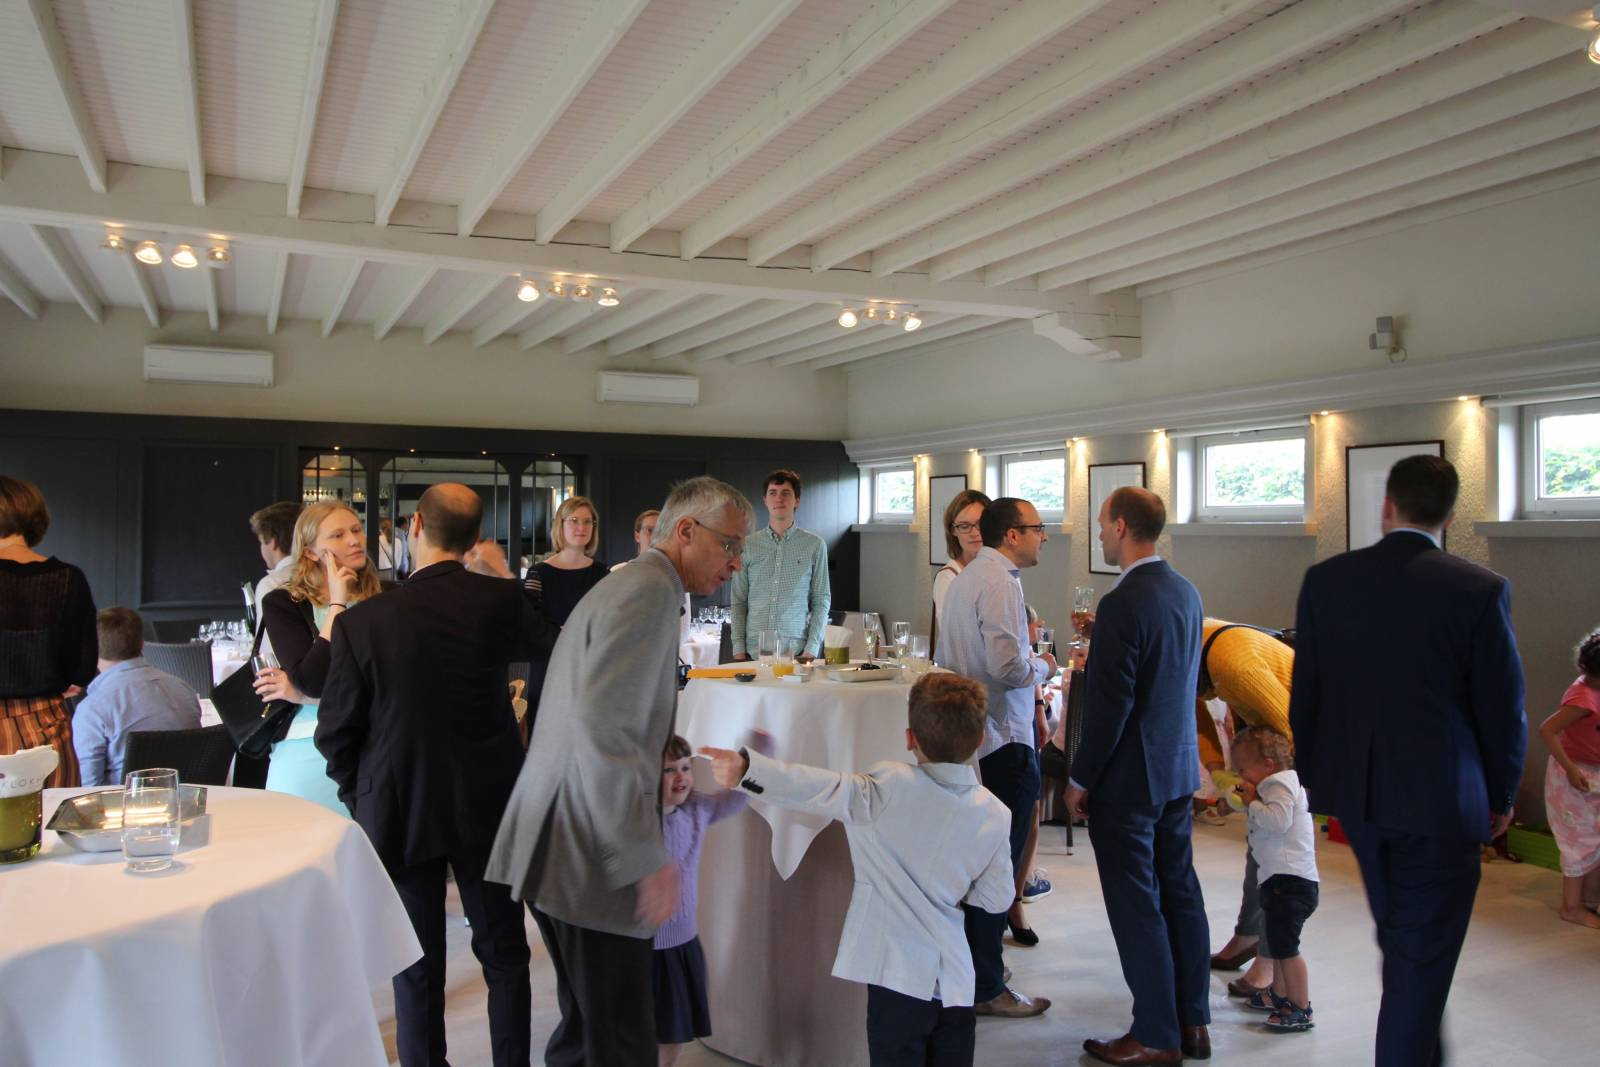 Feestzaal - Klokhof - House of Events(5)